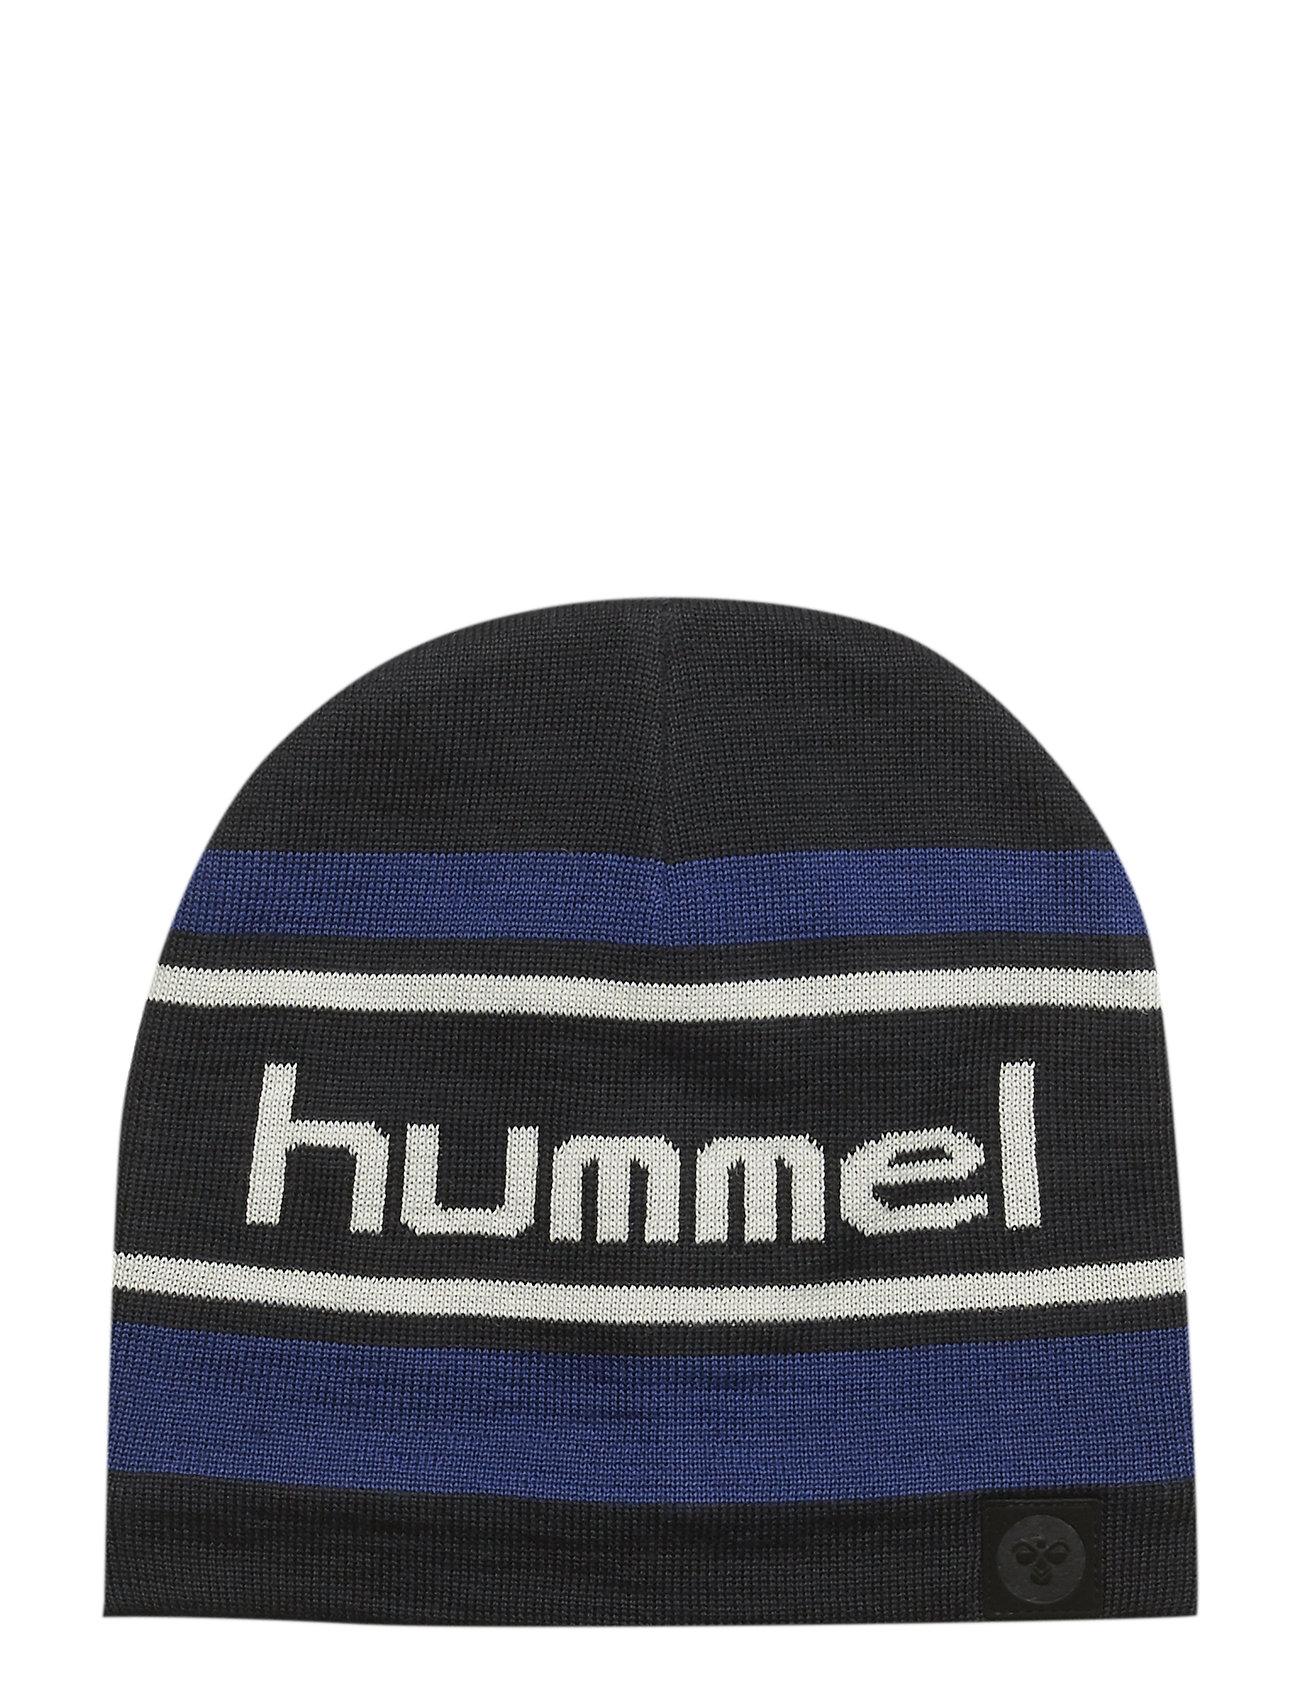 Hummel HMLROB HAT - DARK NAVY